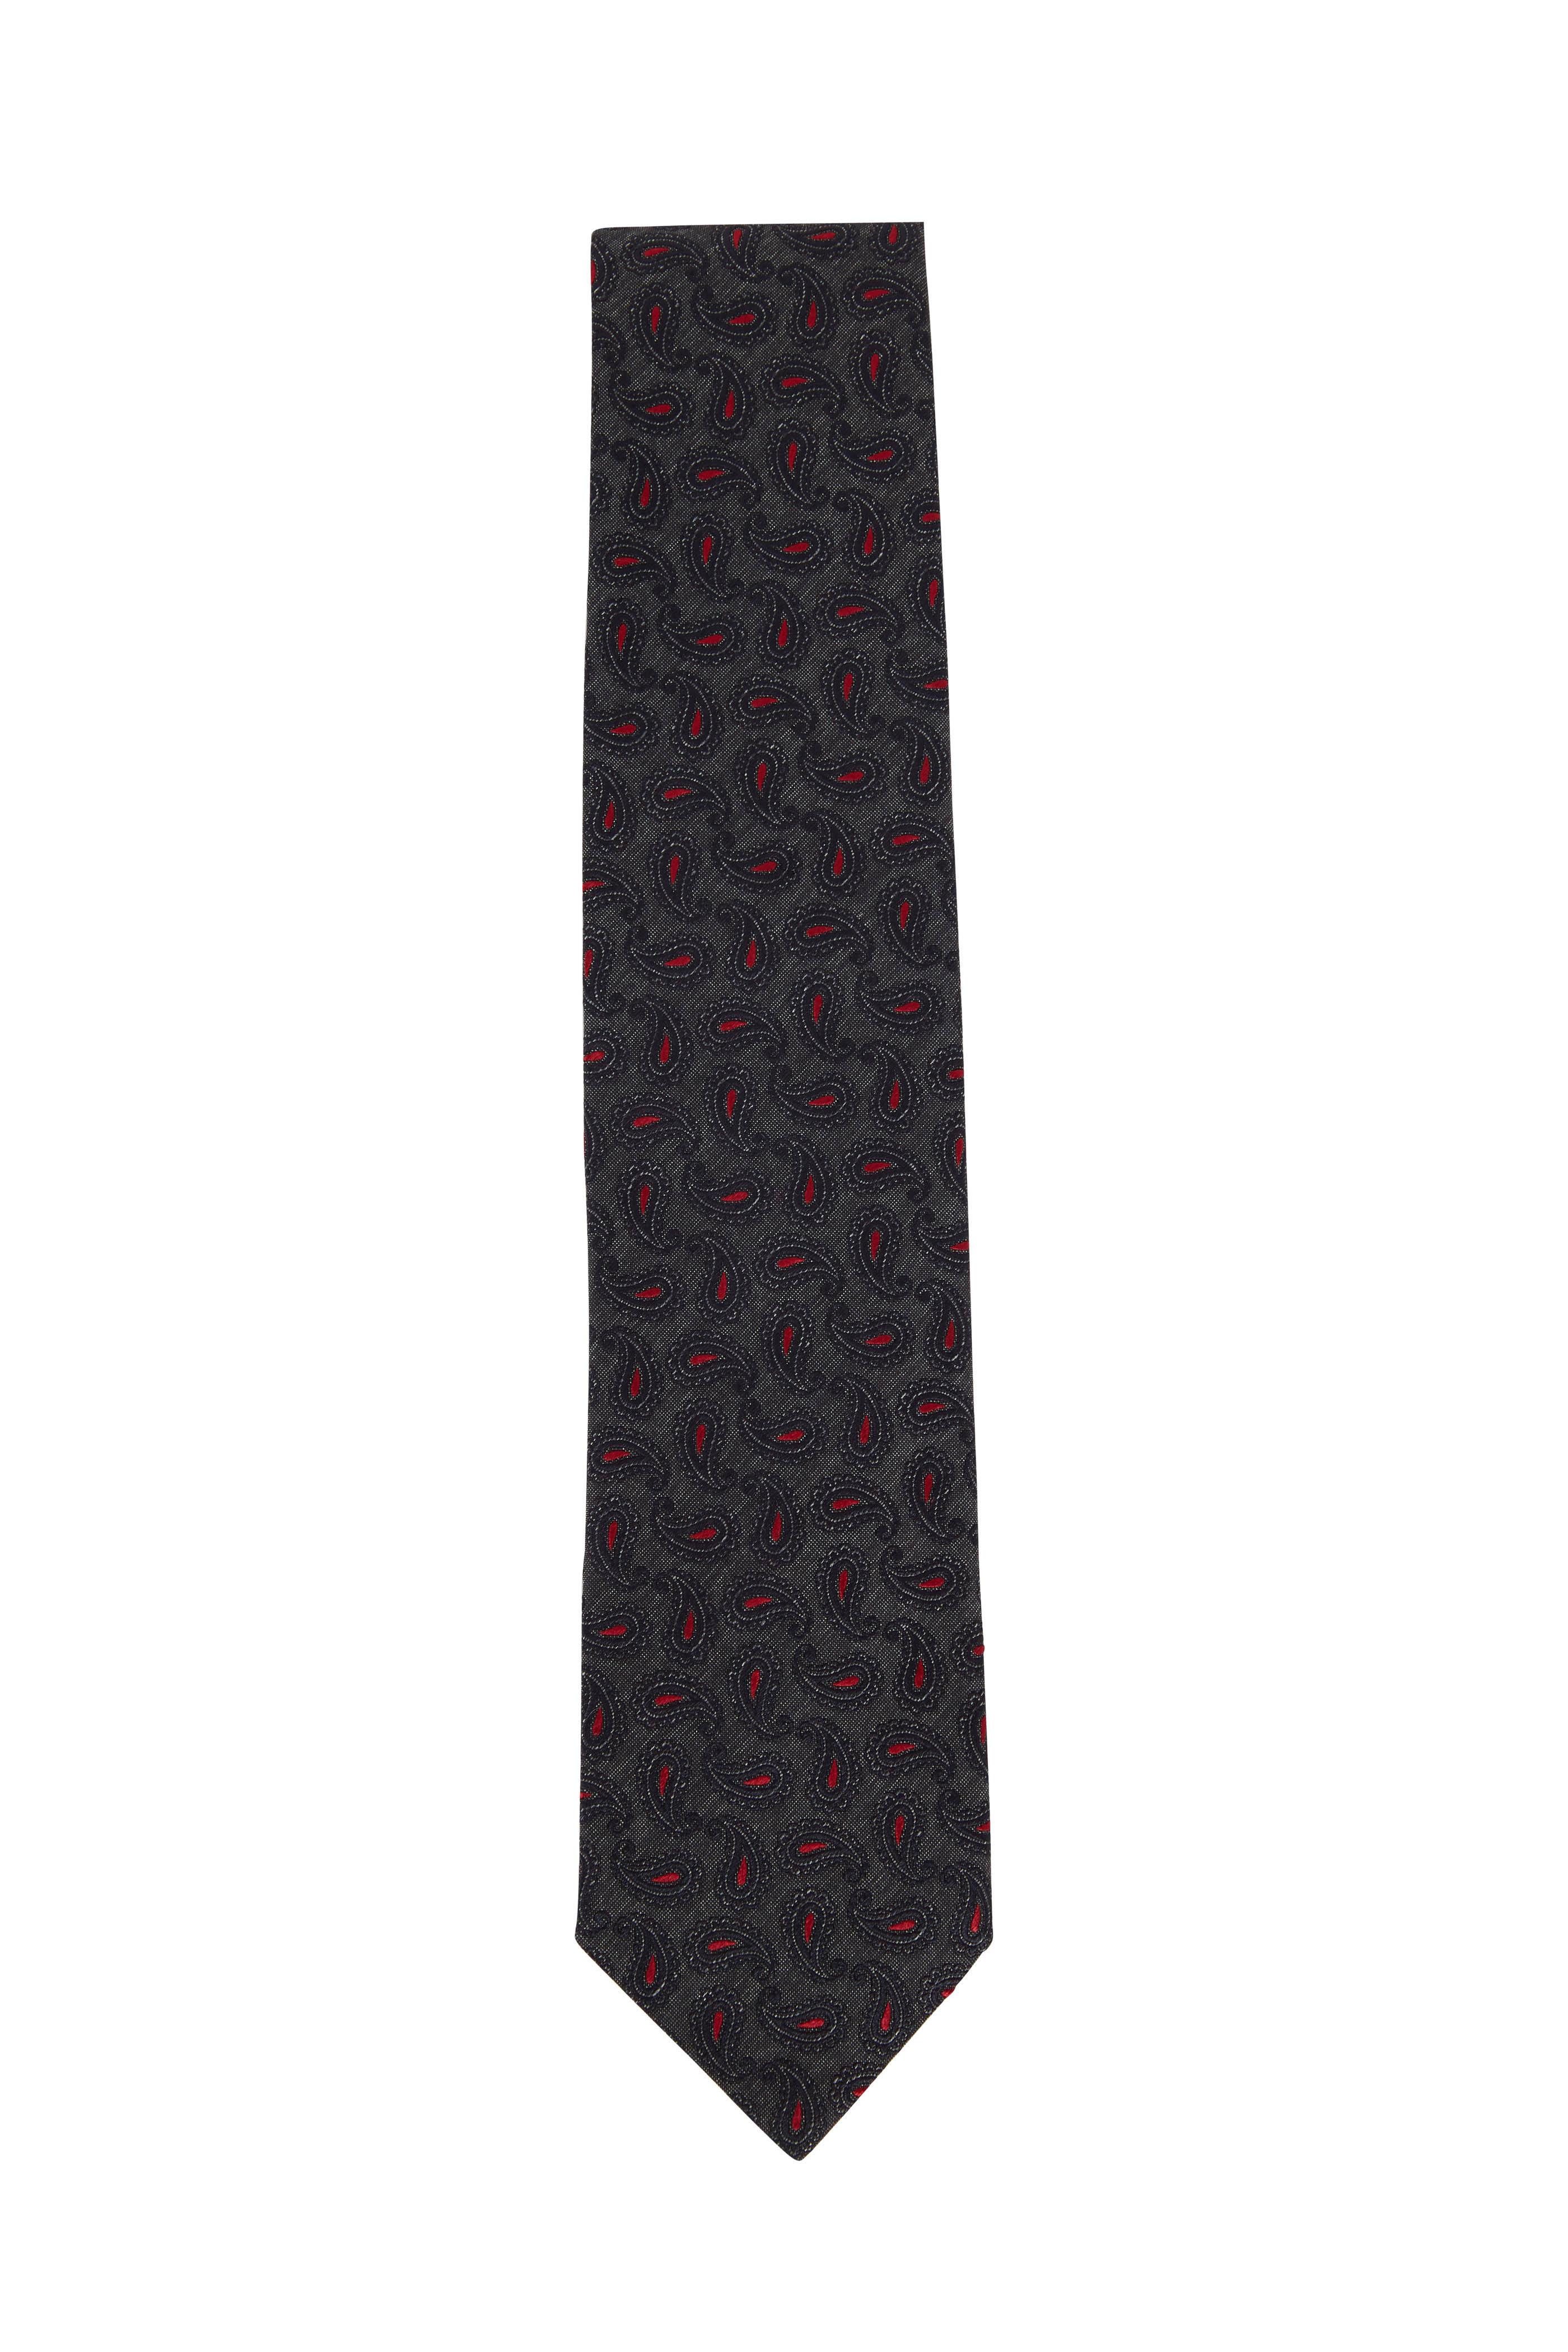 b2302cf4e7 Ermenegildo Zegna - Dark Gray & Red Paisley Silk Necktie | Mitchell ...